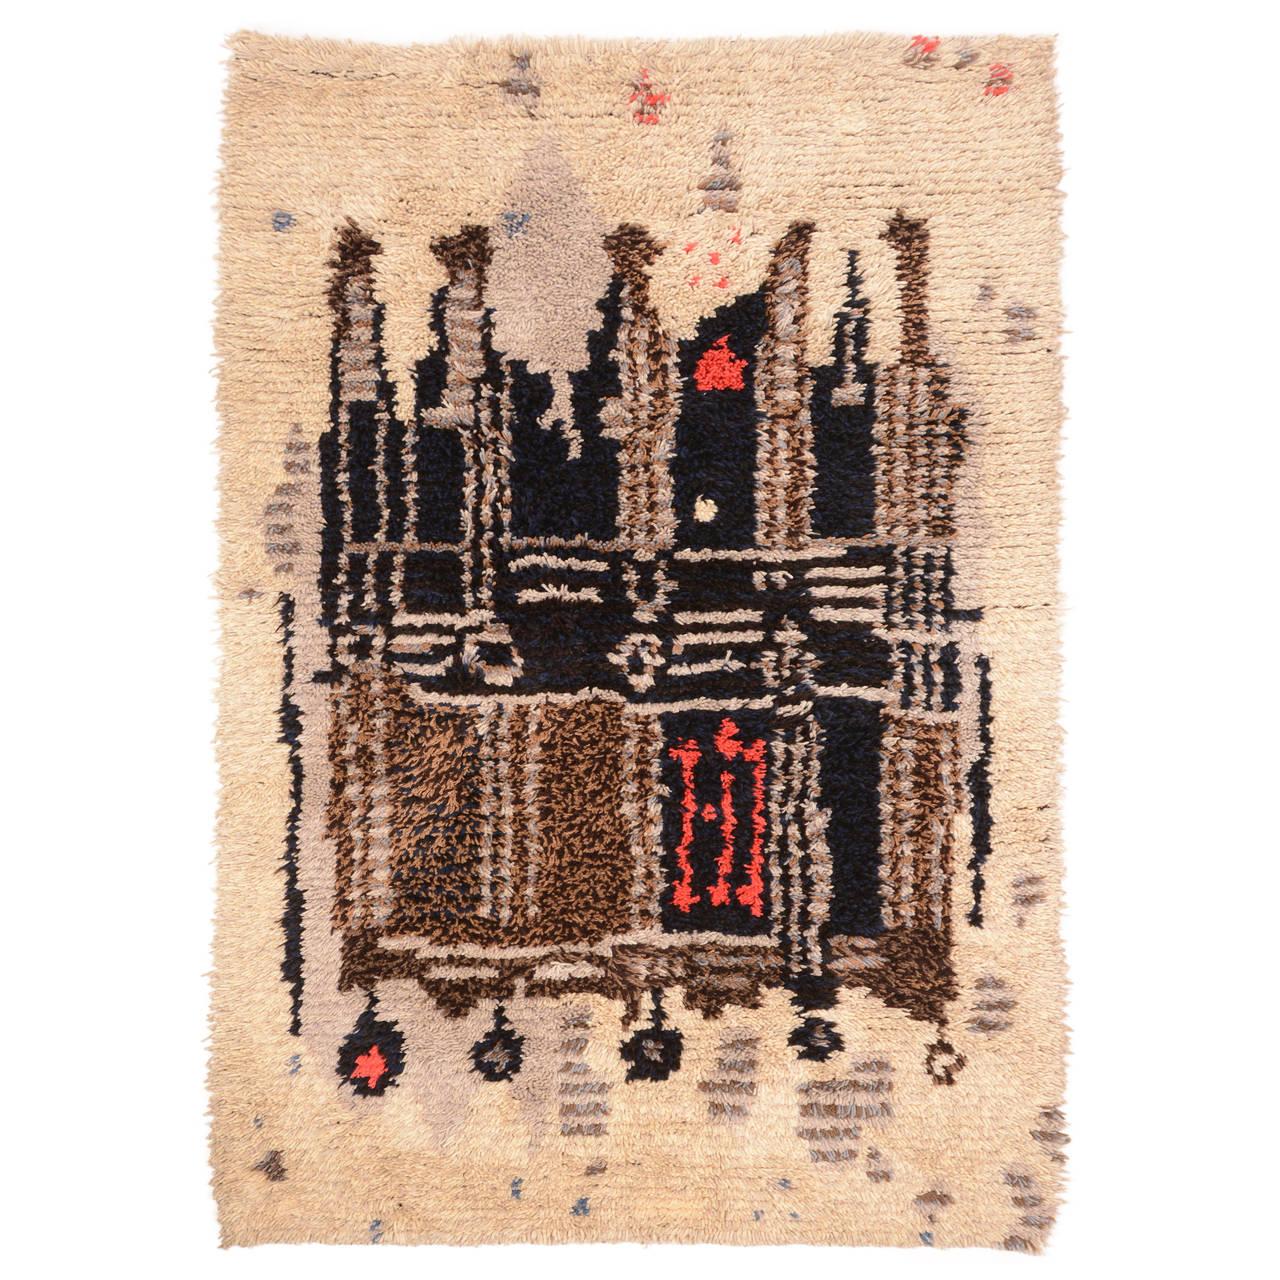 Midcentury Scandinavian Modern Rya Wool Rug Wall Hanging For Sale